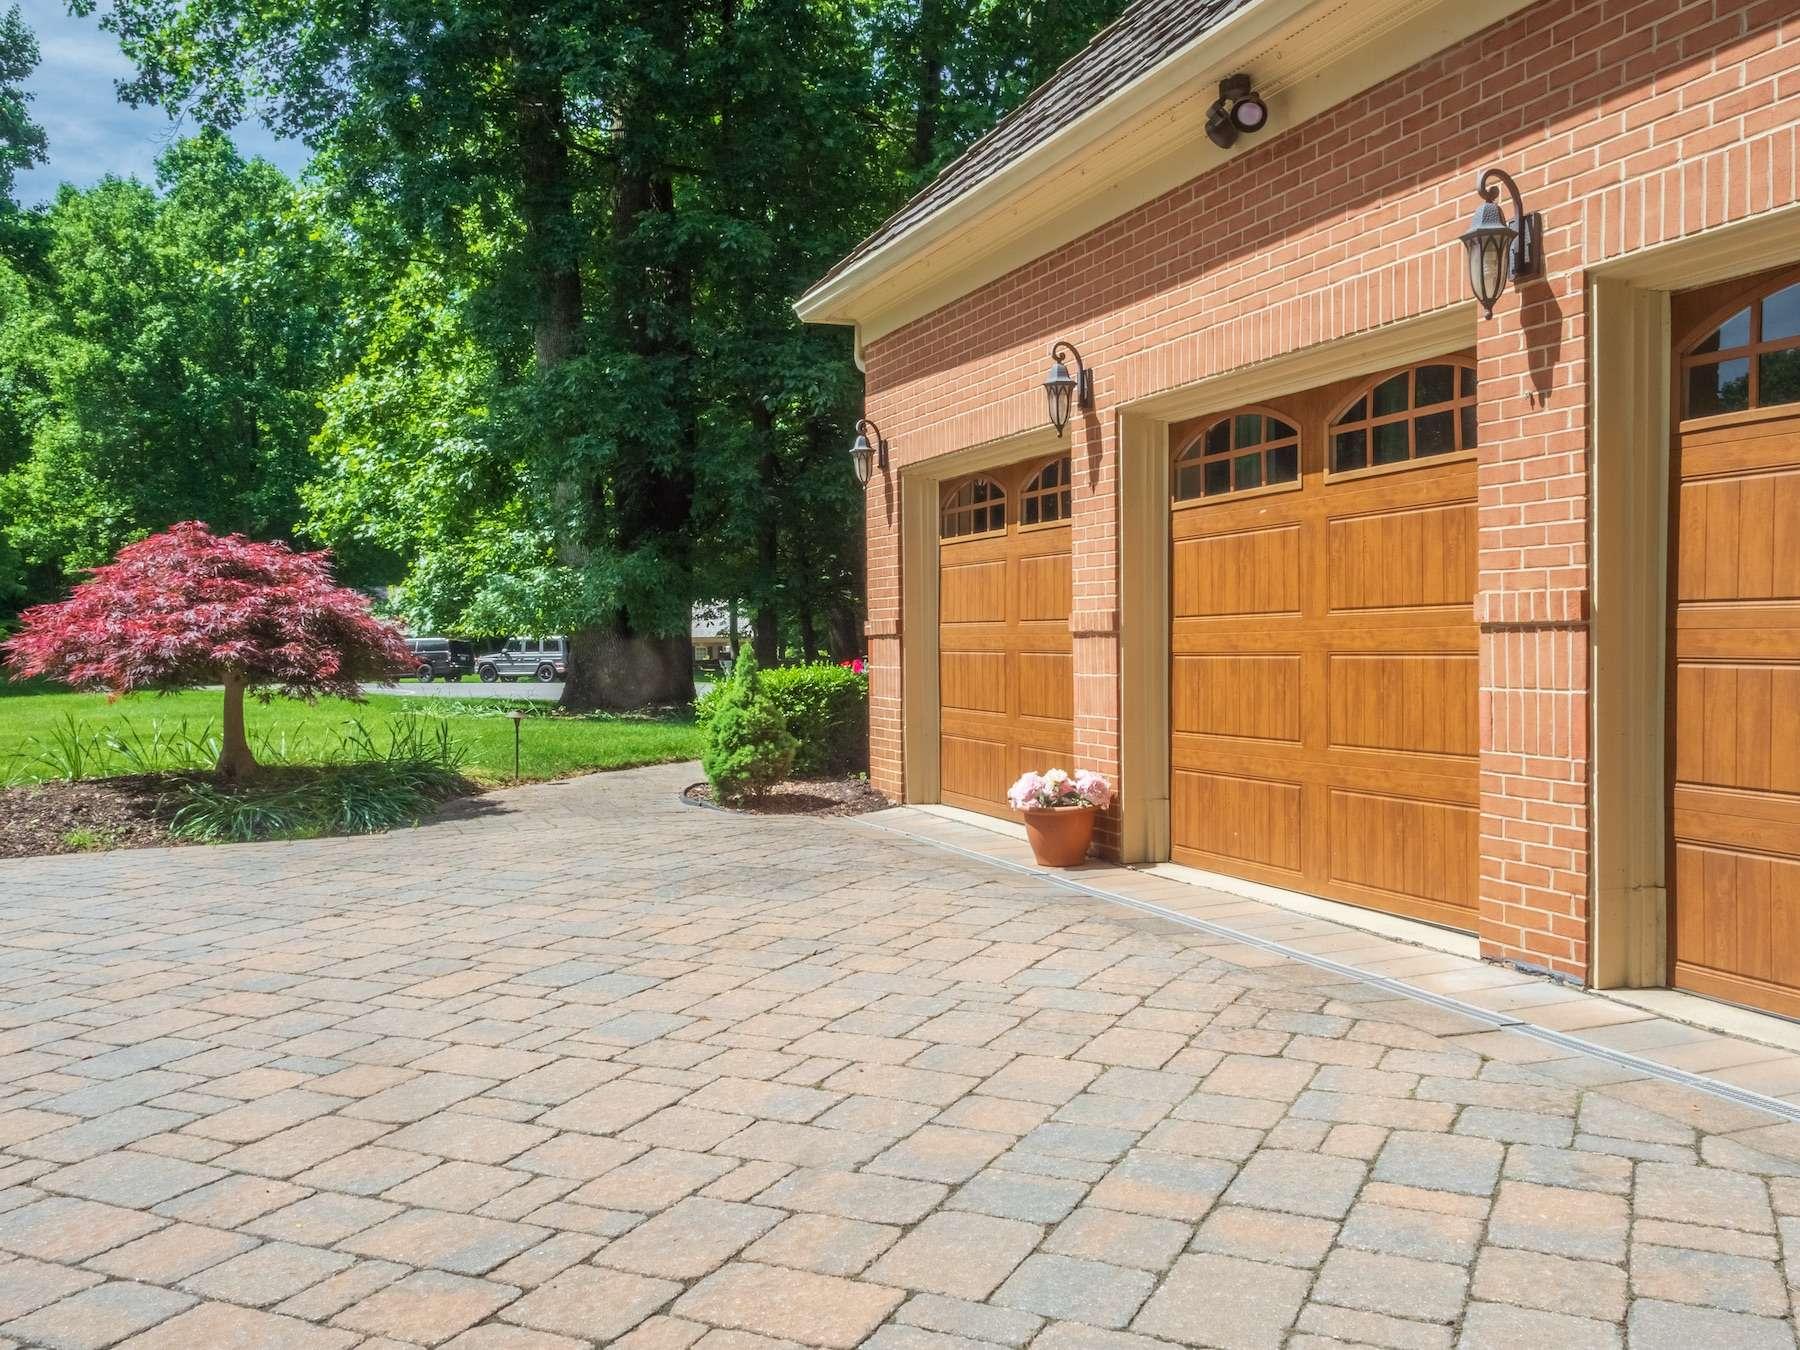 Paver driveway and garage